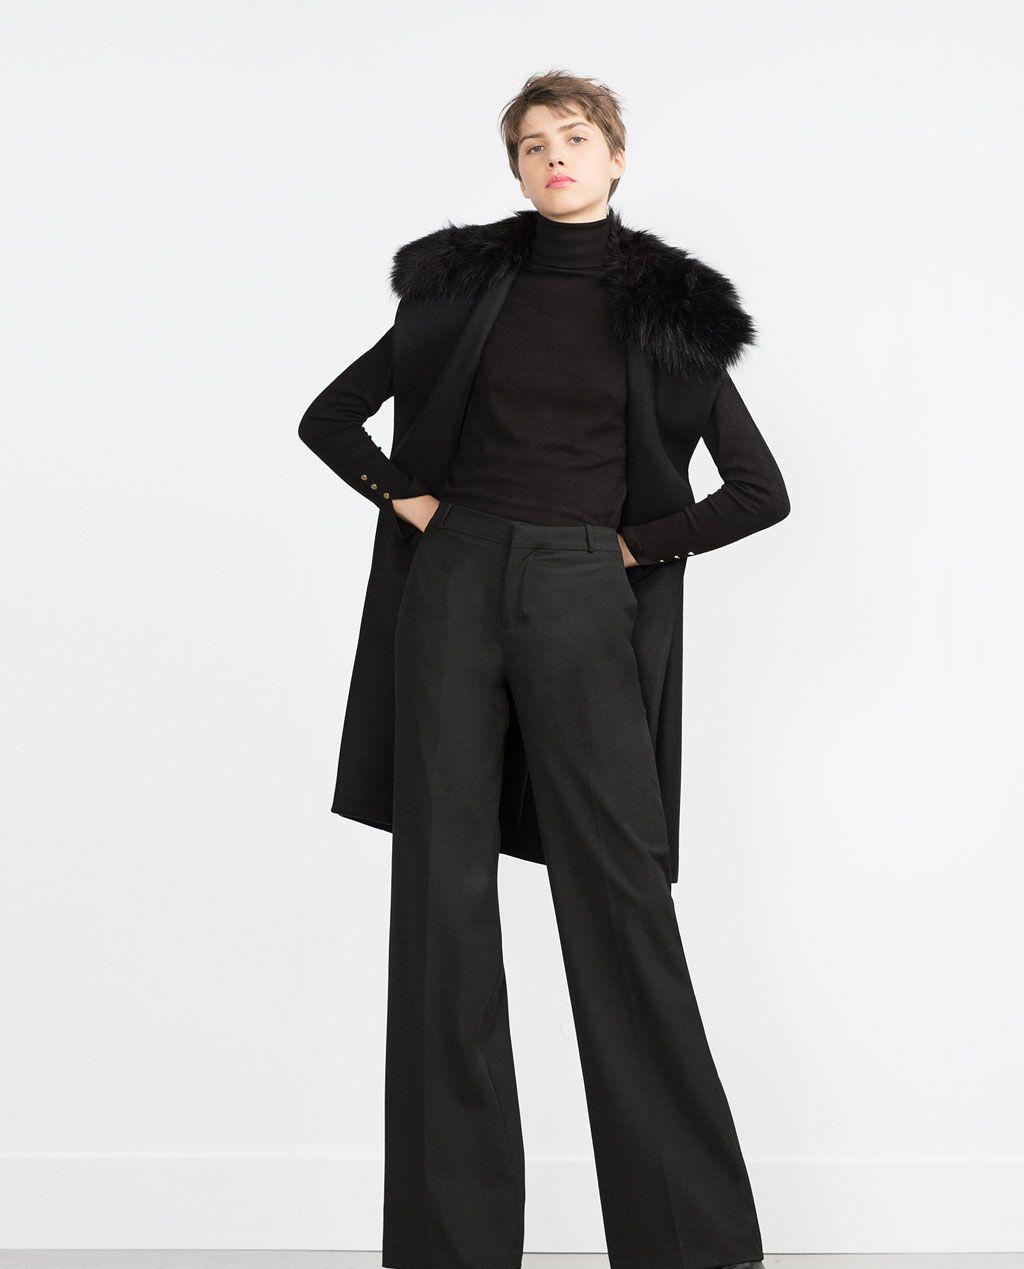 Fur All Outerwear WomanZara Collar View Long With Faux Waistcoat N8XZwPk0nO